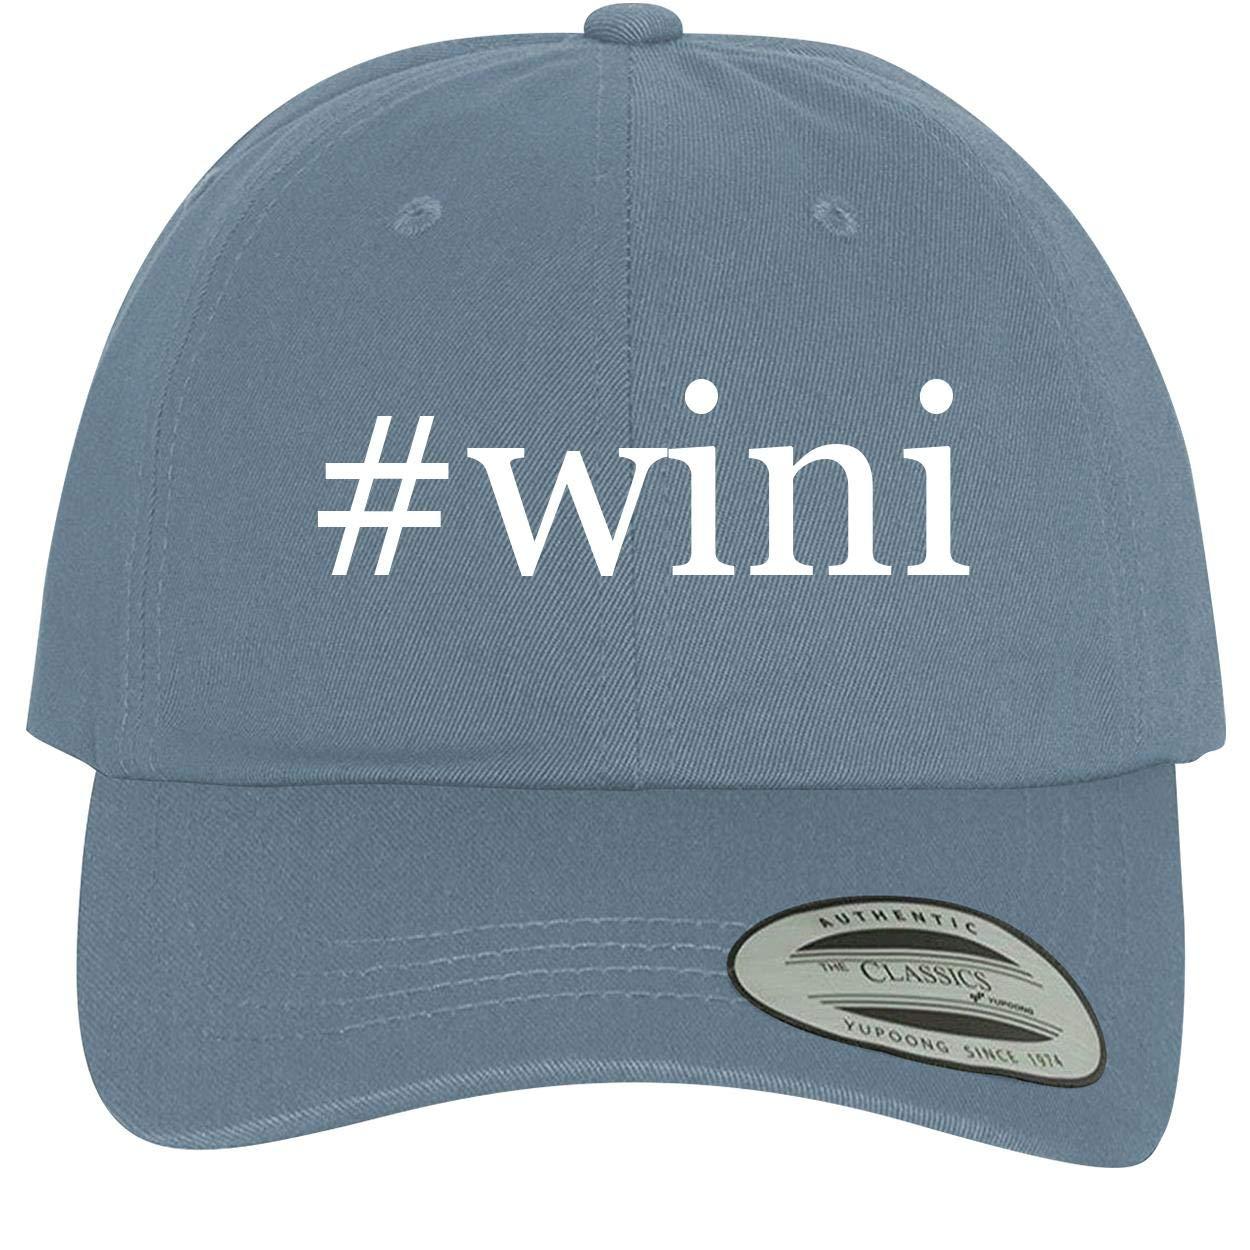 BH Cool Designs #WINI Comfortable Dad Hat Baseball Cap